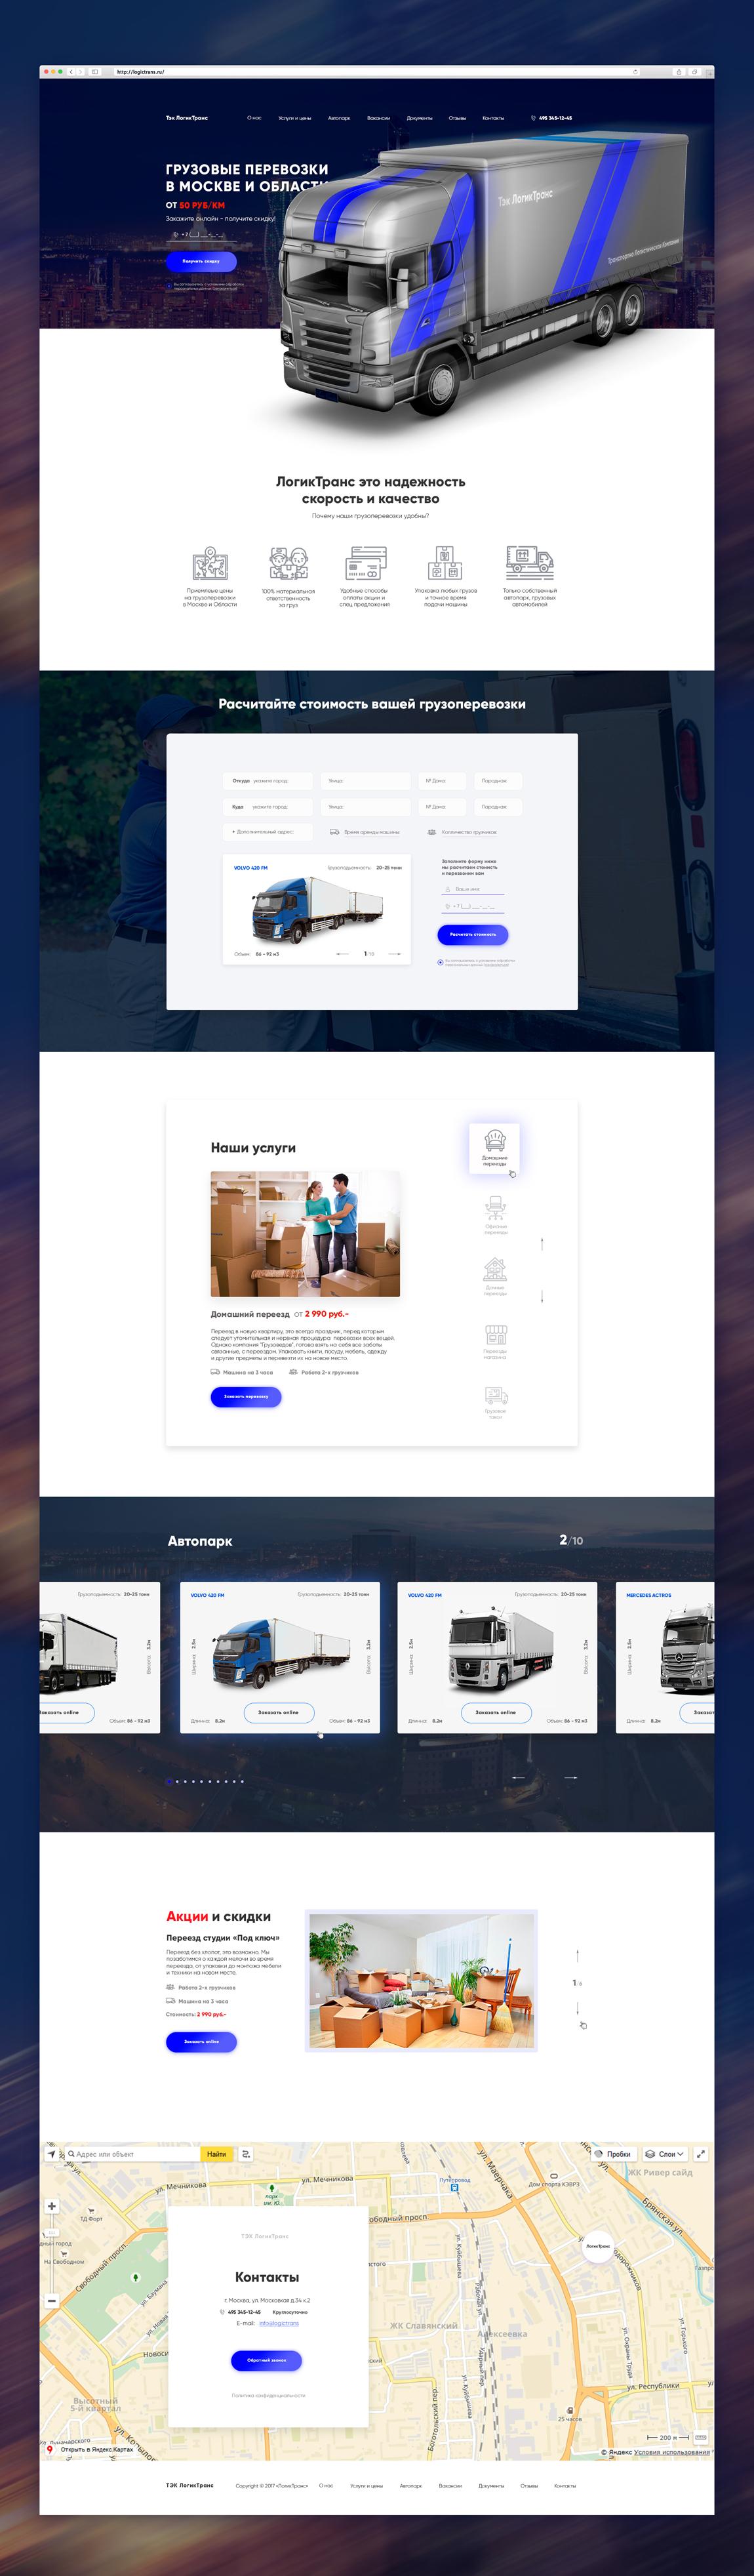 Дизайн сайта транспортно-экспедиторской компании ЛогикТранс фото f_3565a42a629577db.jpg